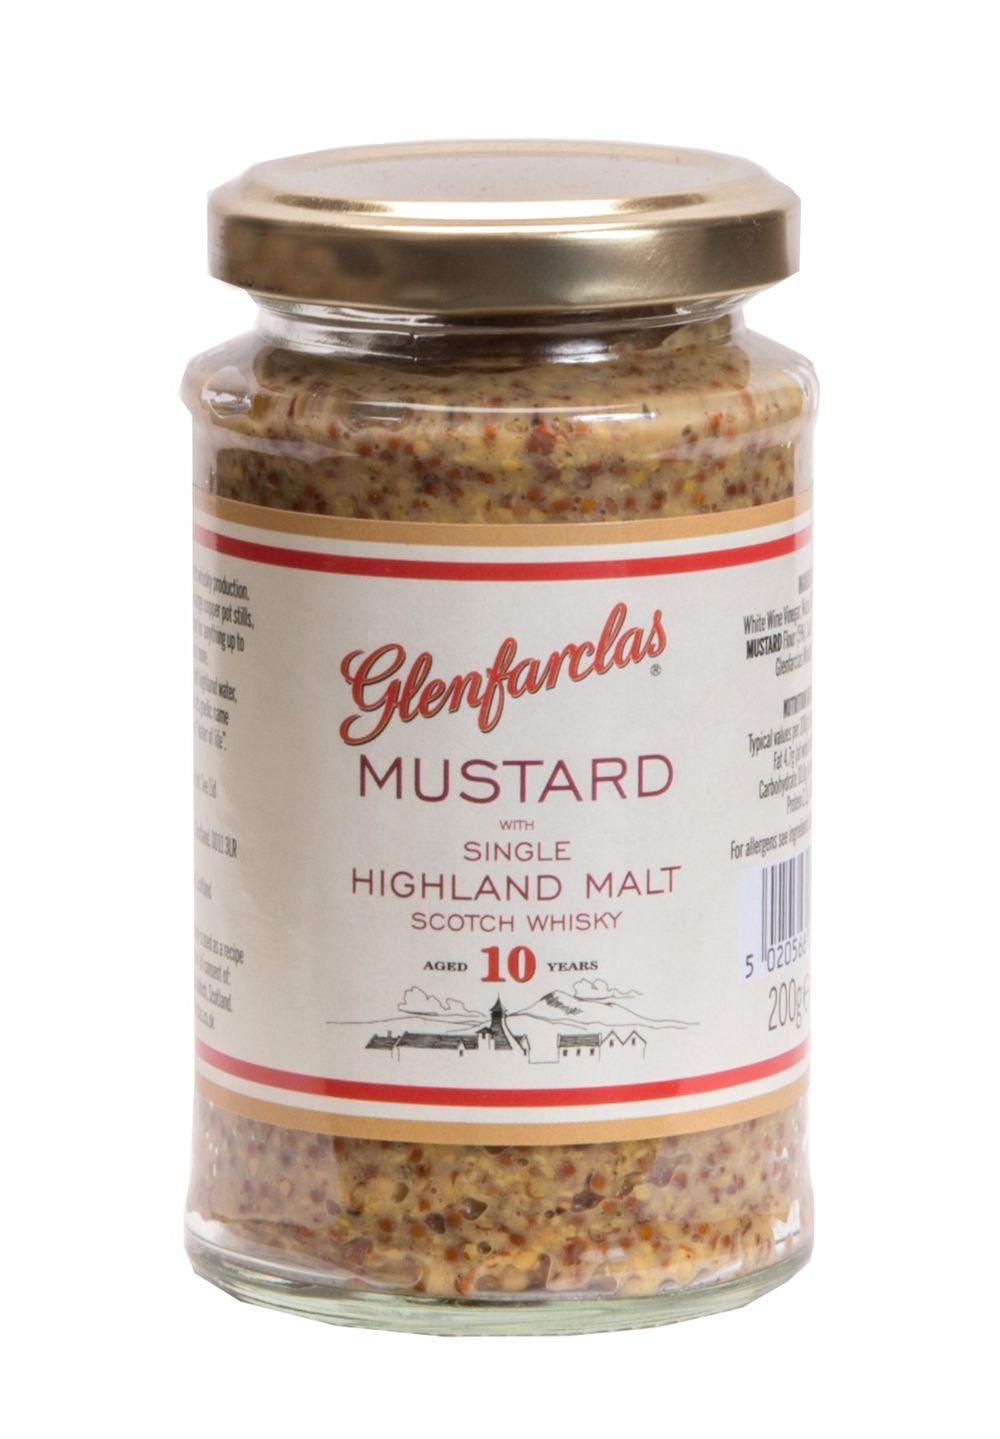 Glenfarclas Mustard